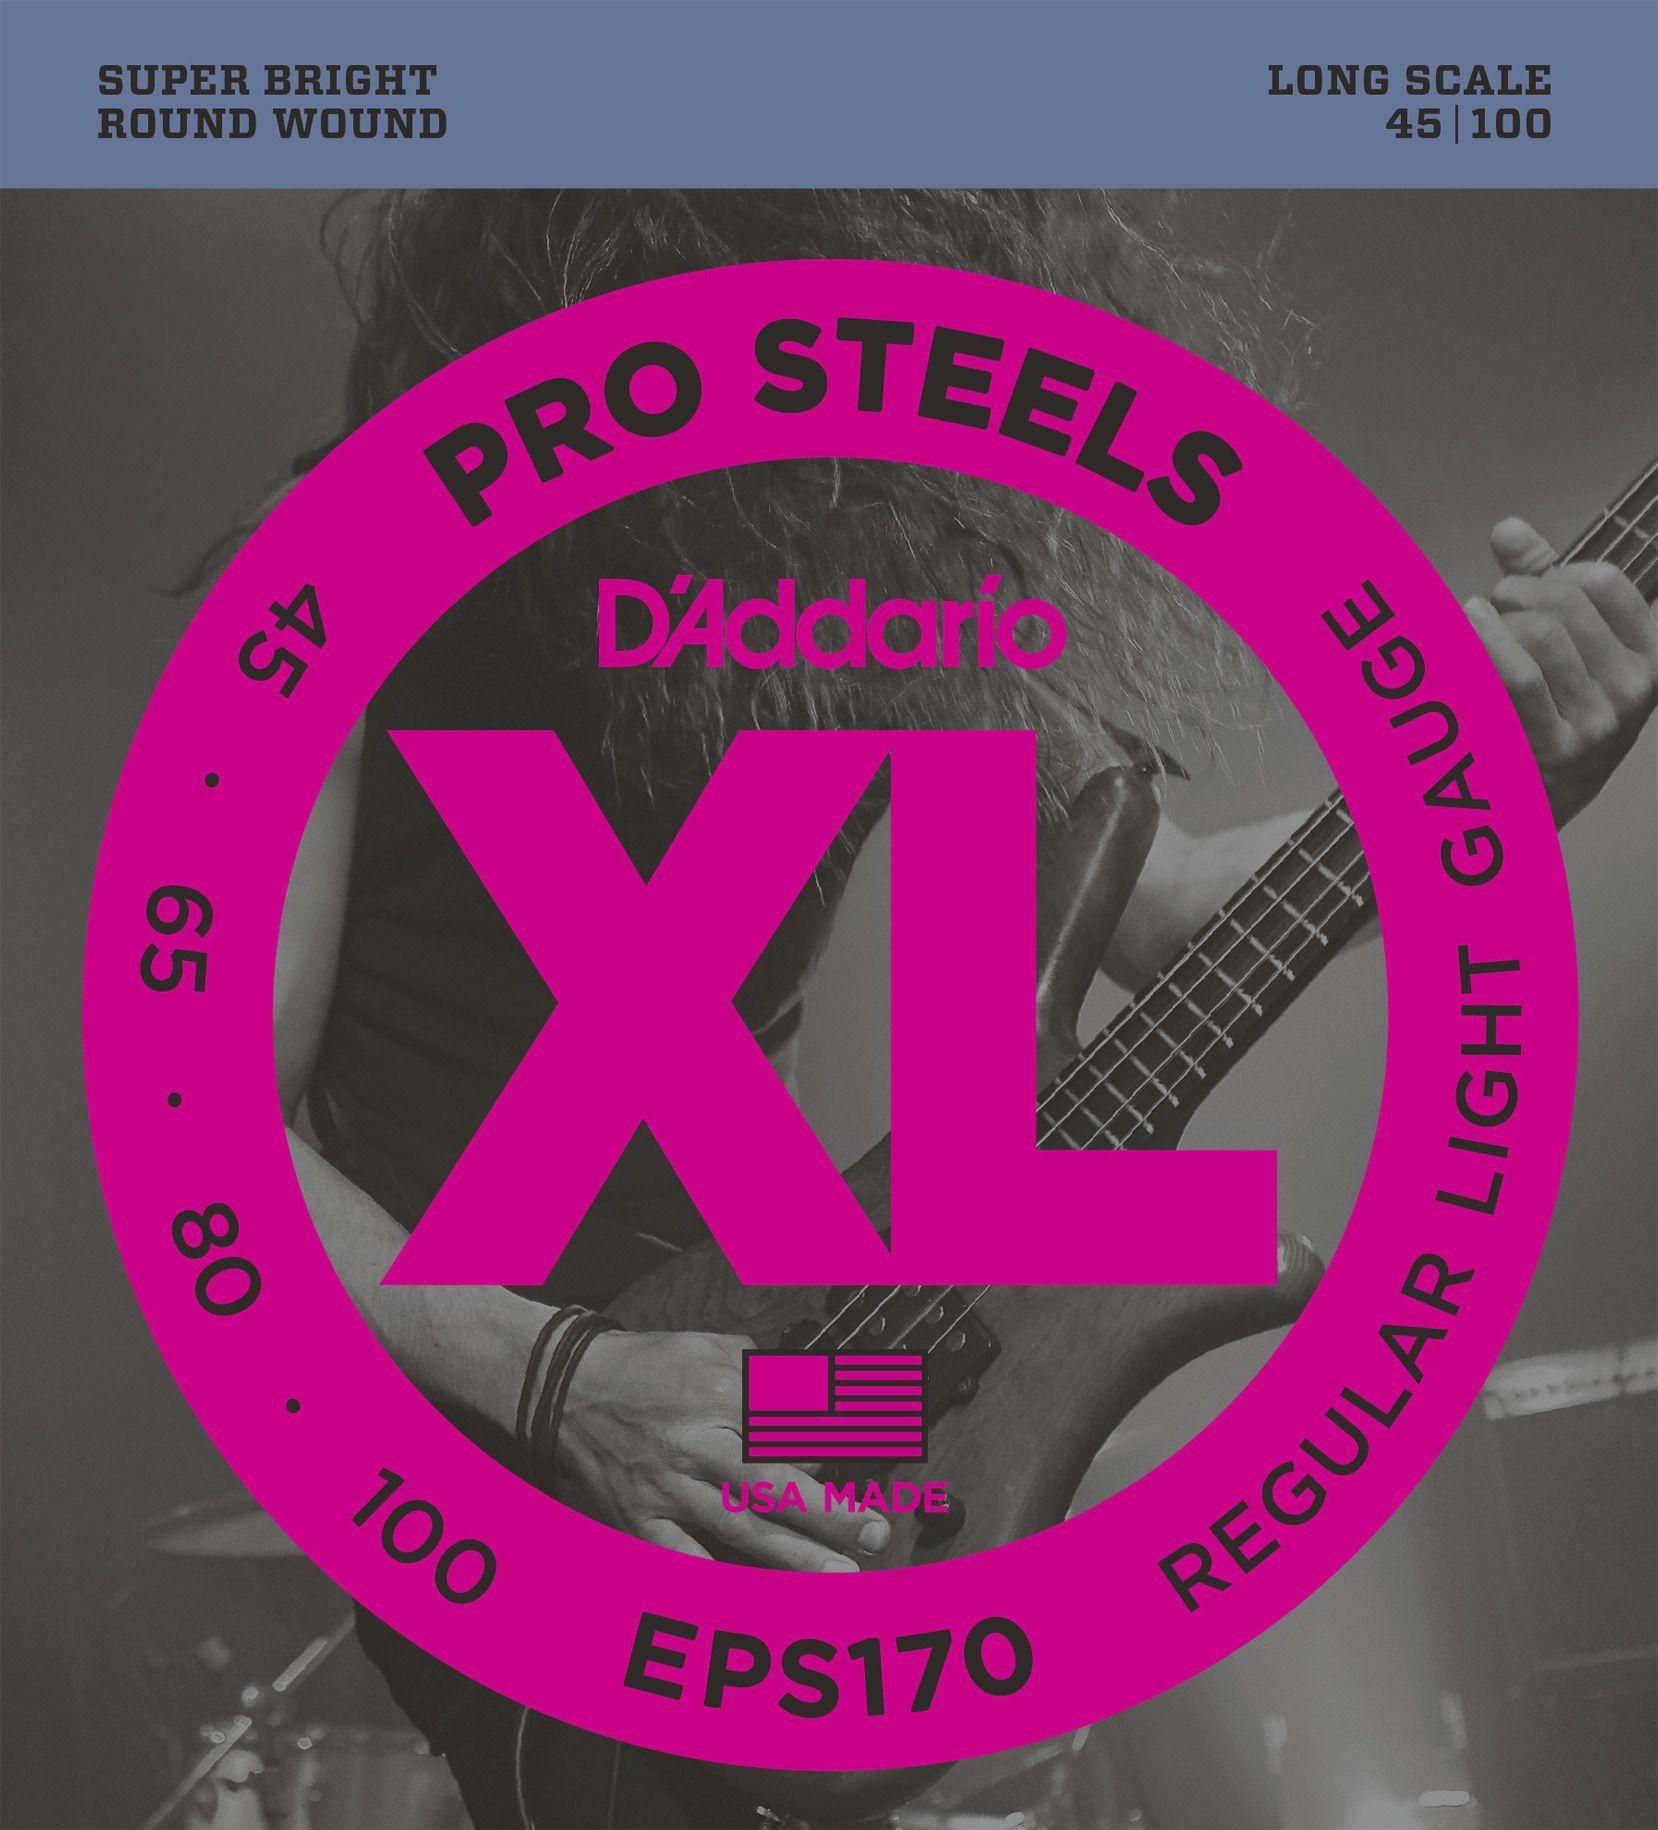 D'Addario EPS170, Prosteels 4 String Bass Strings 045-100